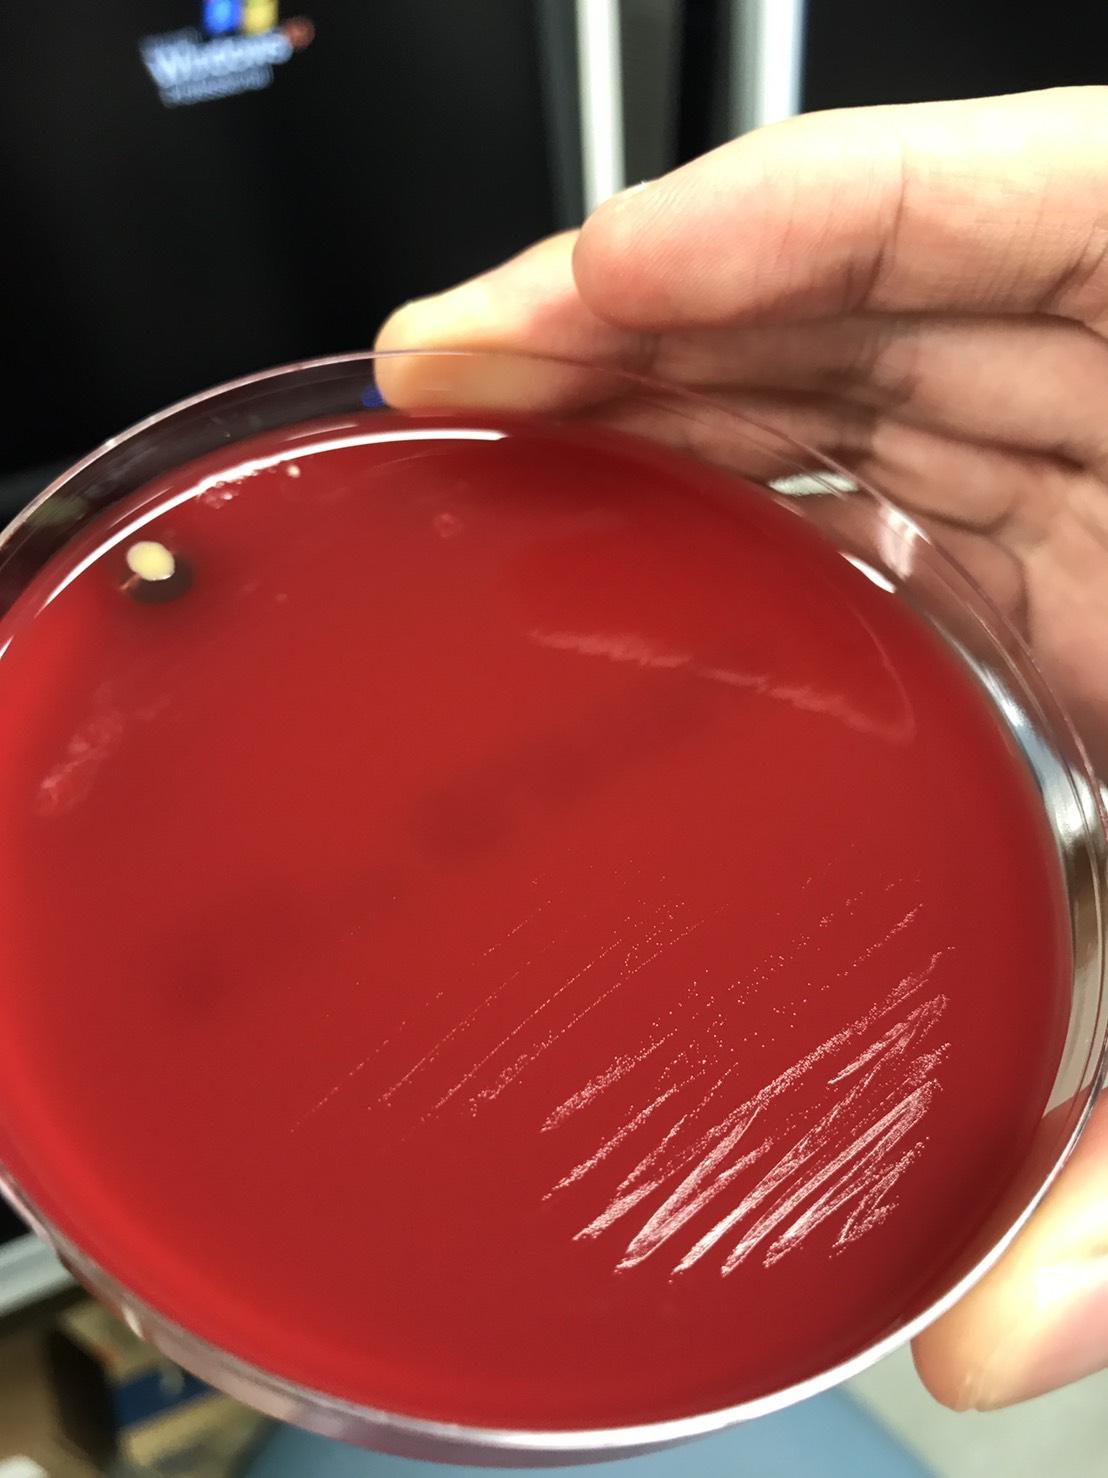 Mycoplasma hominis〔なにこれ見えない〕   グラム染色: Gram Stain